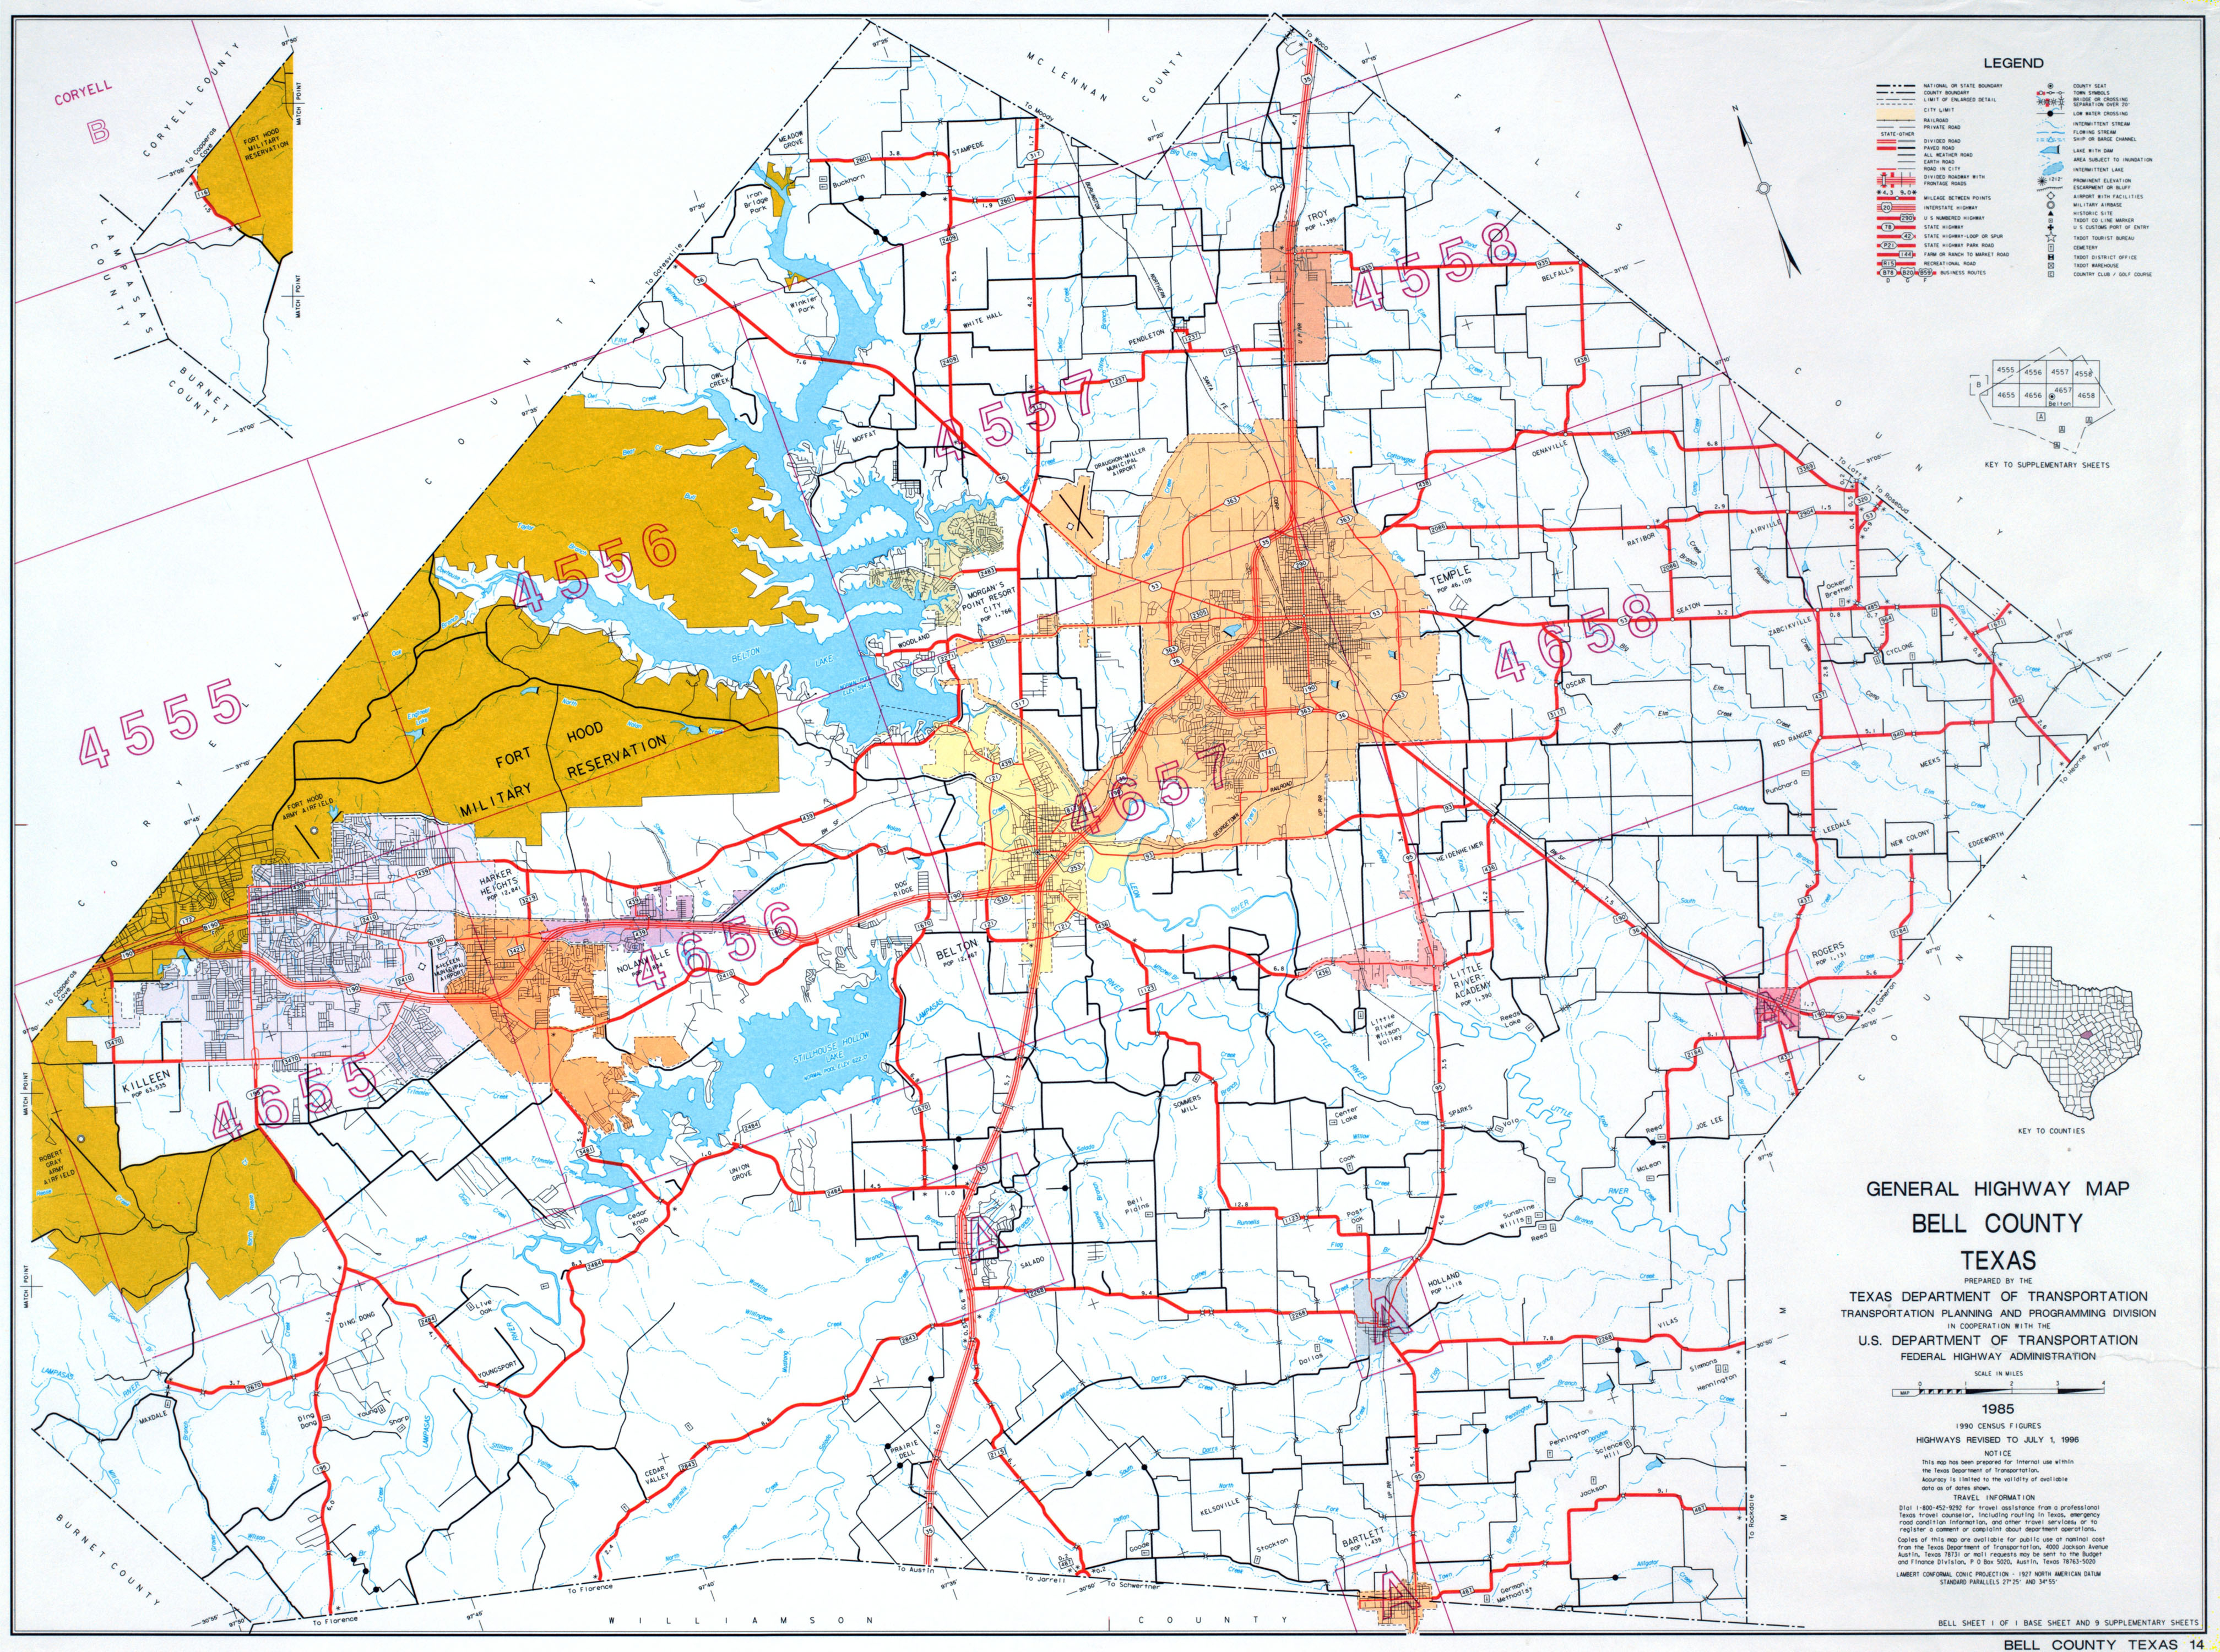 Texas County Highway Maps Browse - Perry-Castañeda Map Collection - Hidalgo County Texas Map